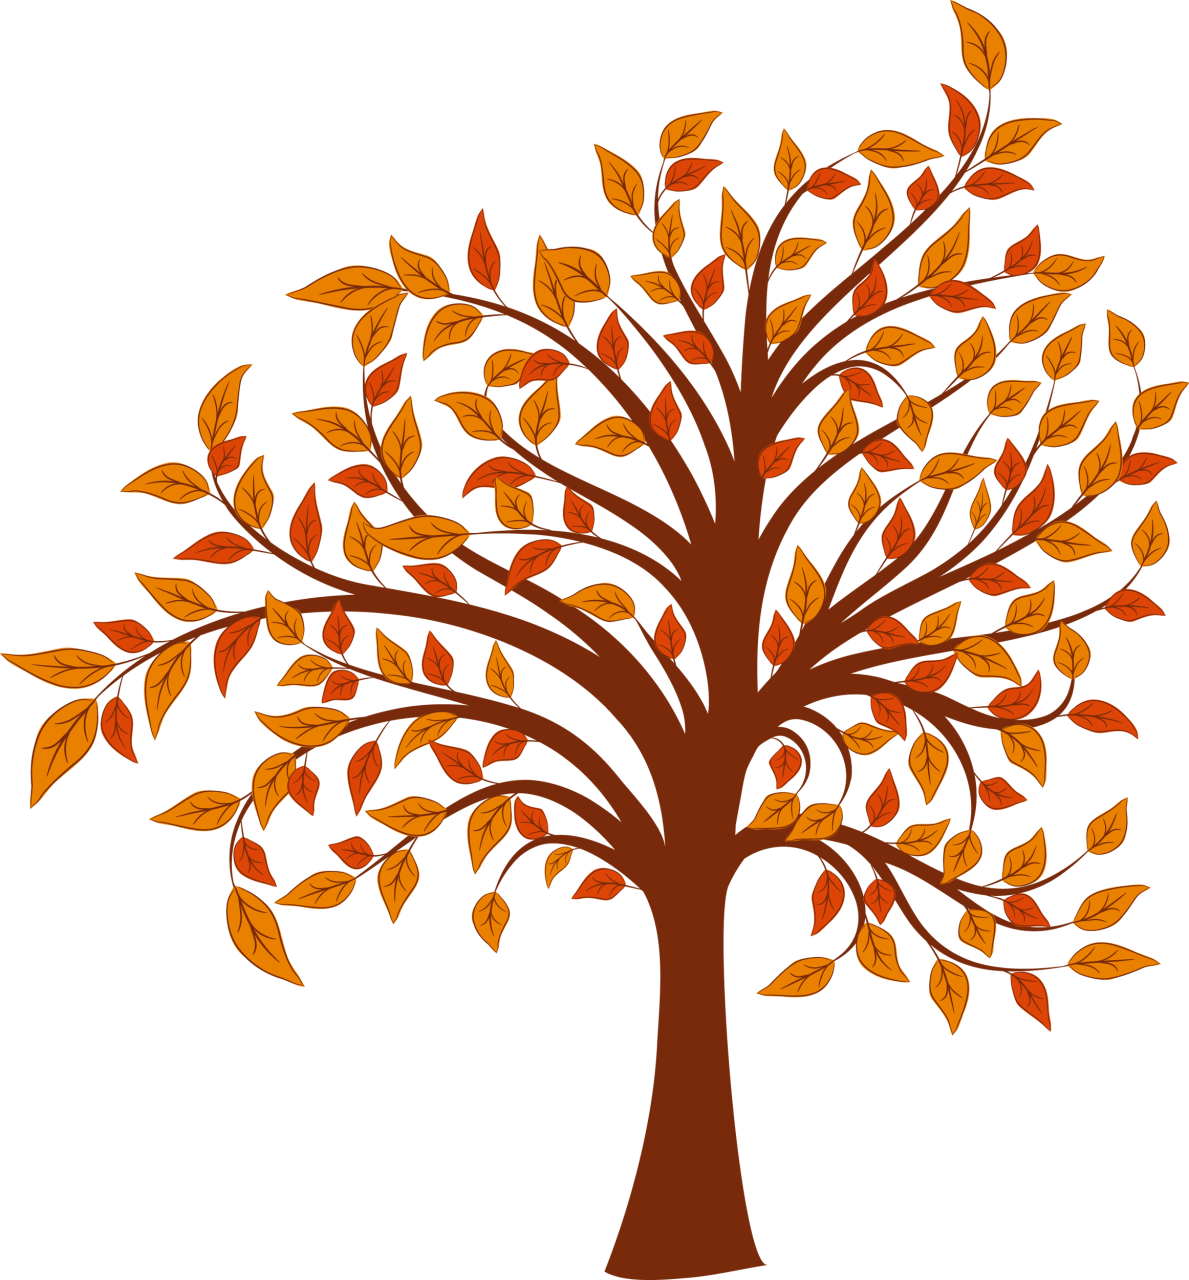 Cute fall tree clipart clip art download Autumn tree clipart free - ClipartFest clip art download